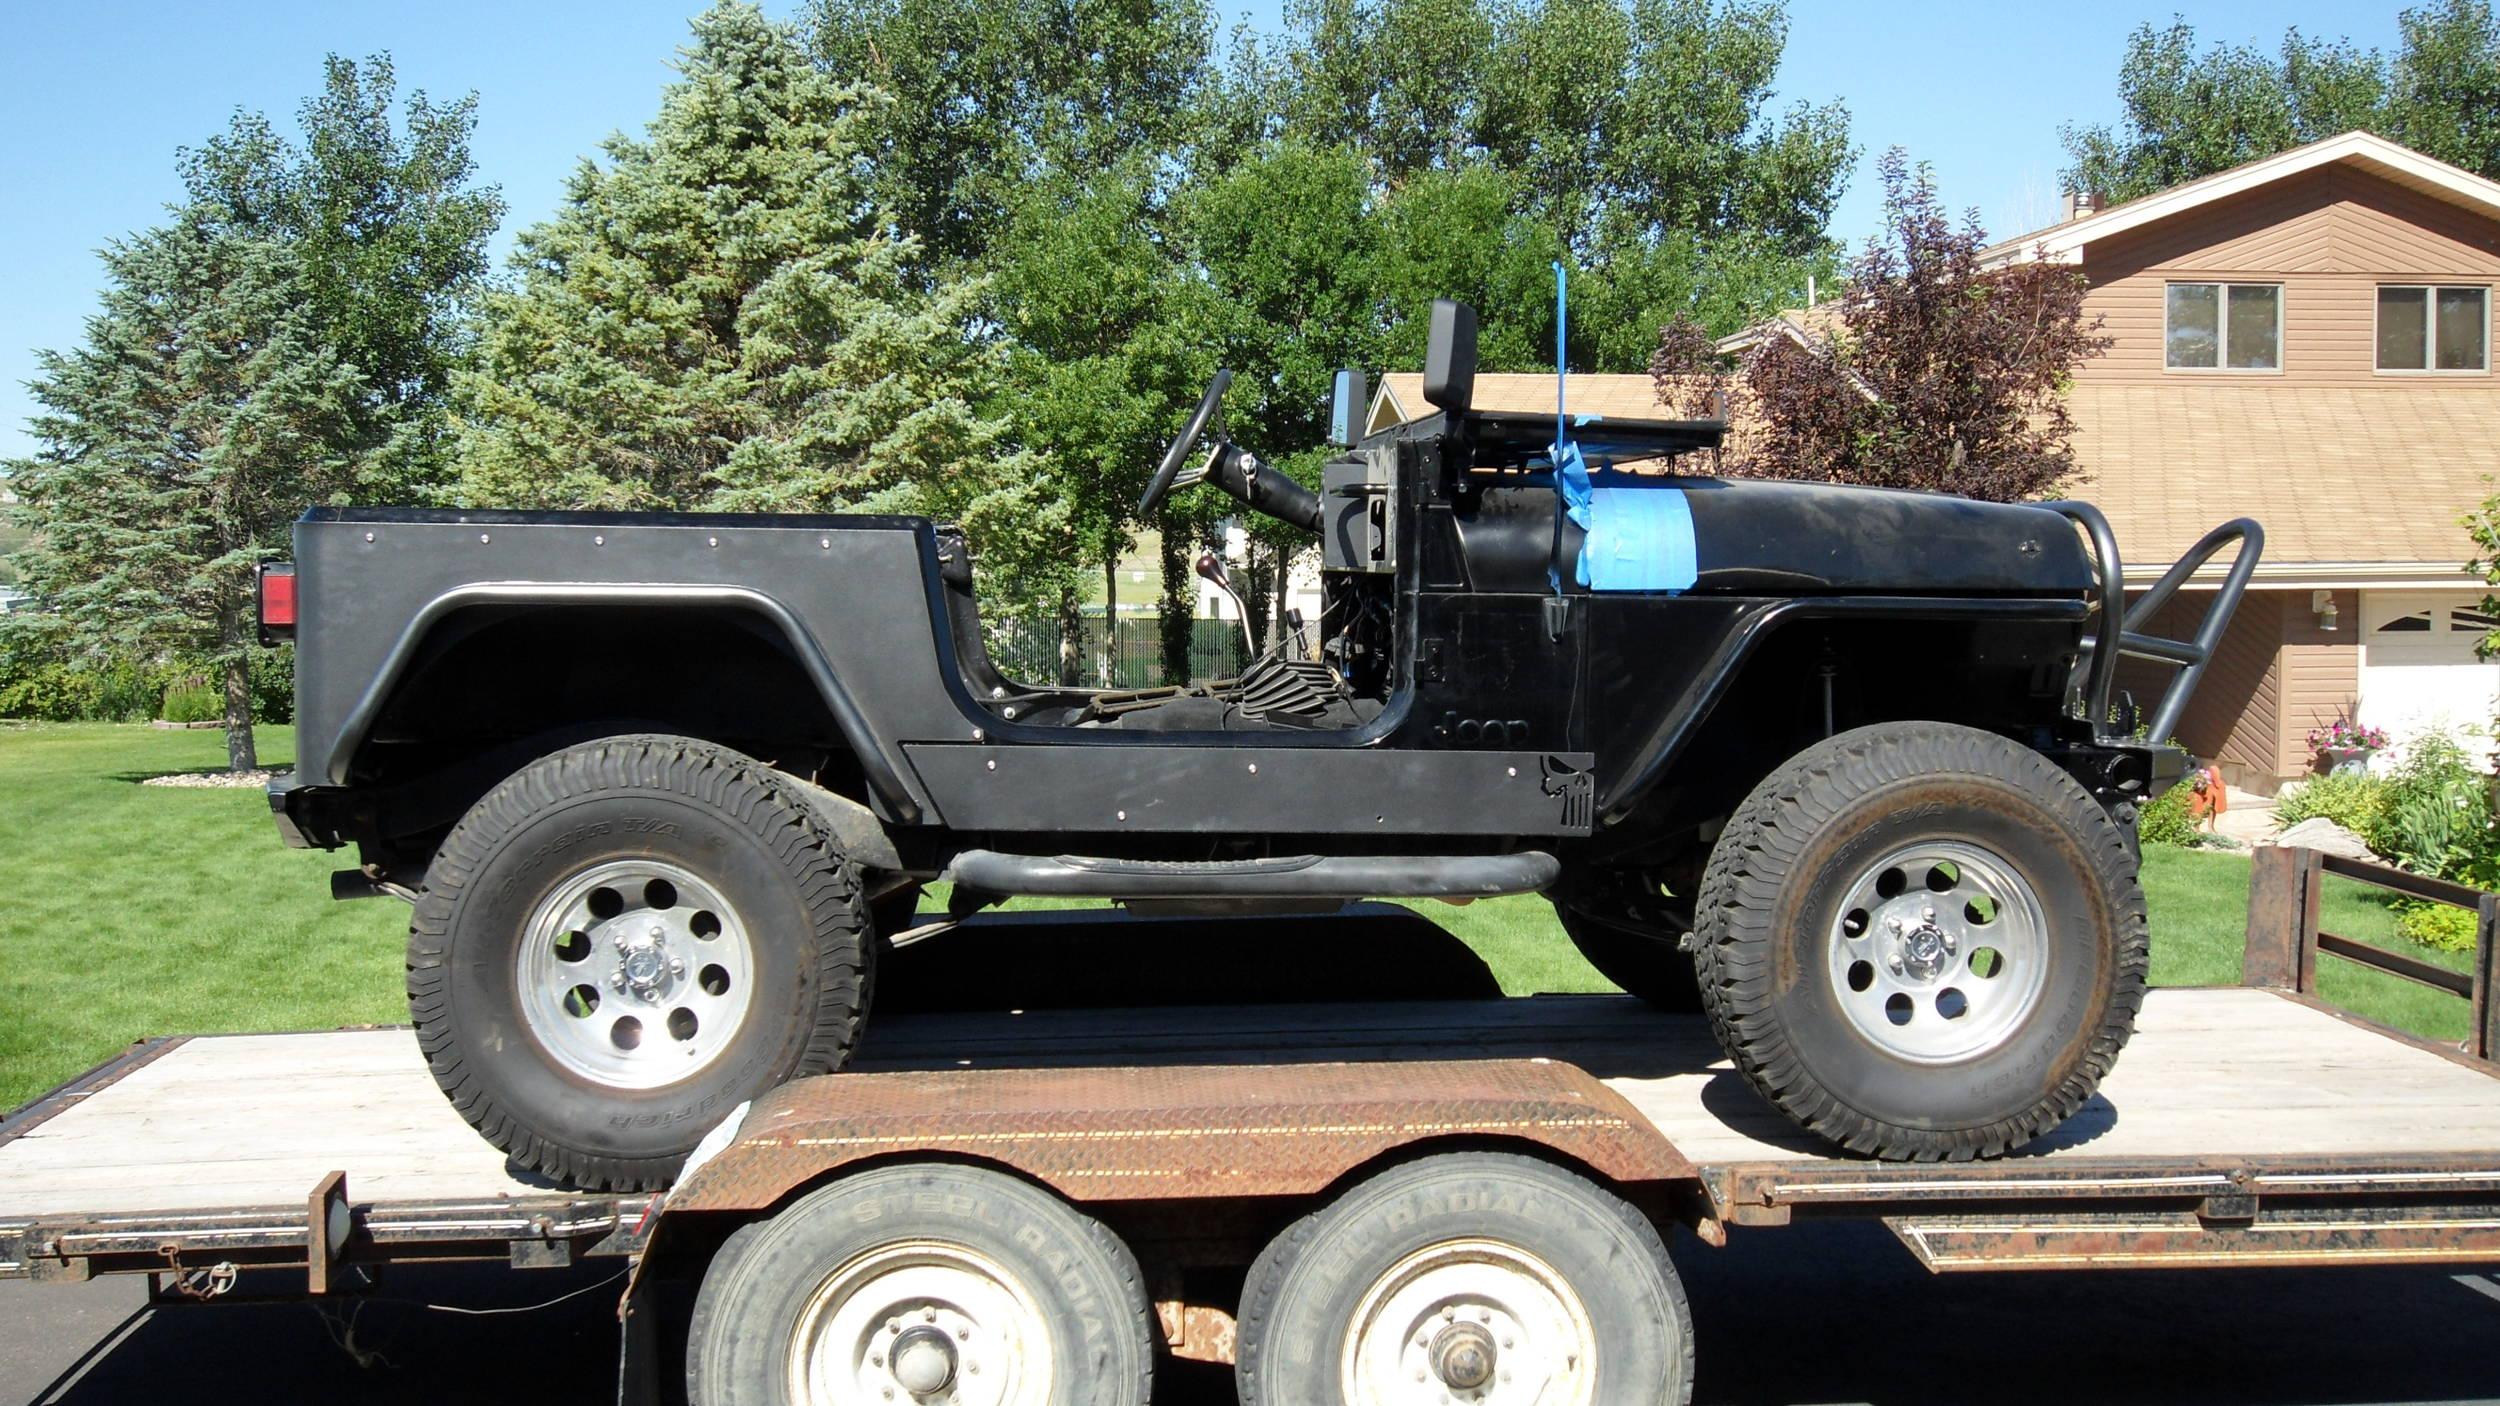 Diy Jeep Body Armor Do It Your Self Diy